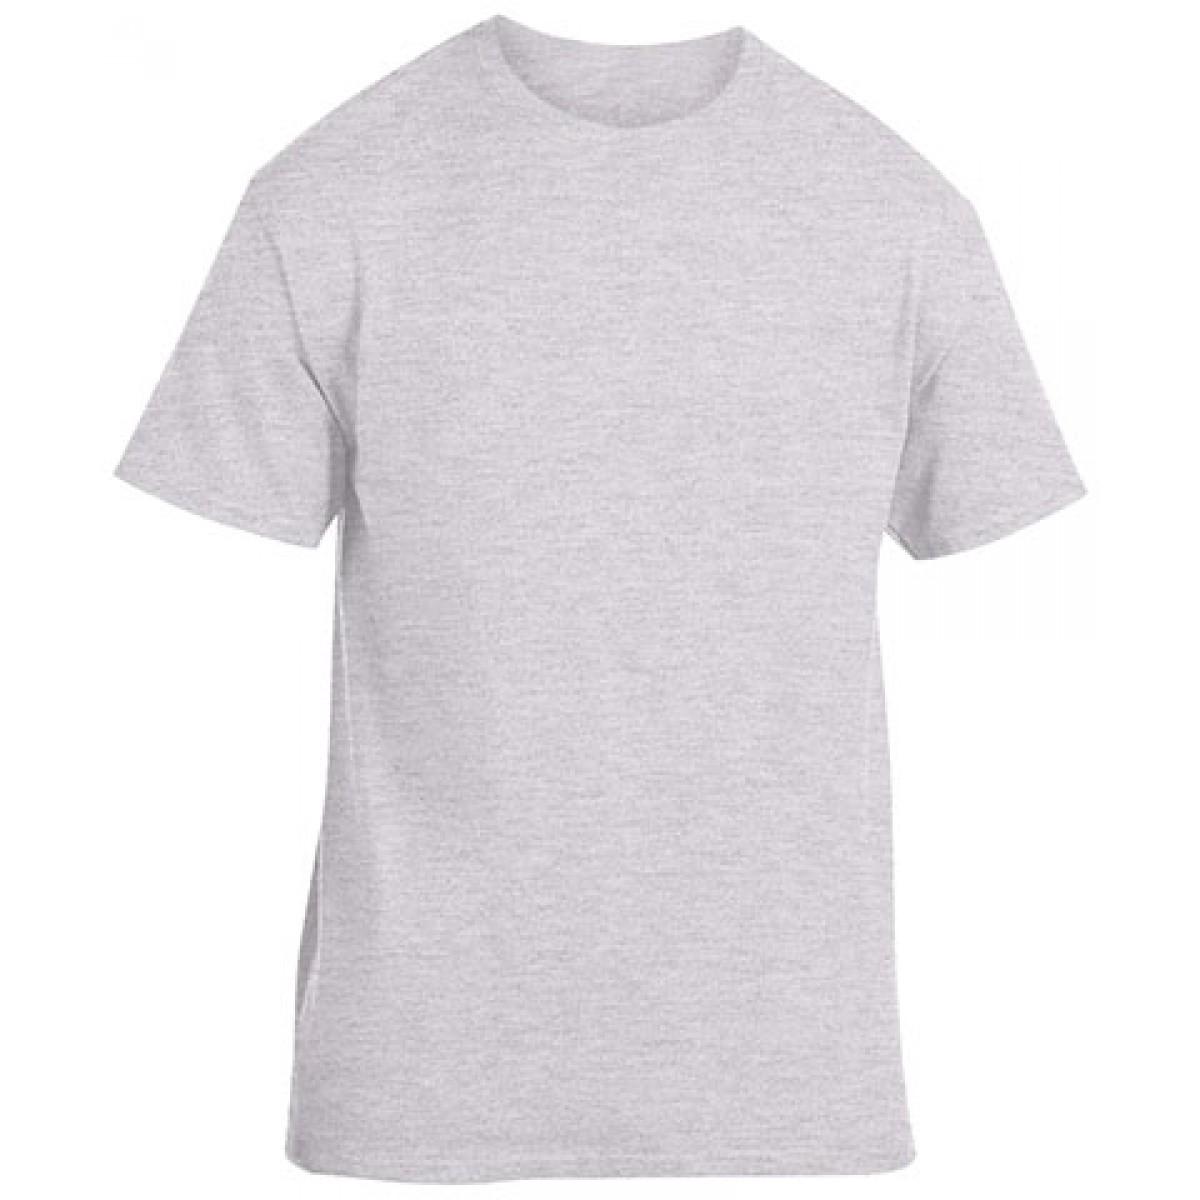 Heavy Cotton Activewear T-Shirt-Sports Grey-2XL